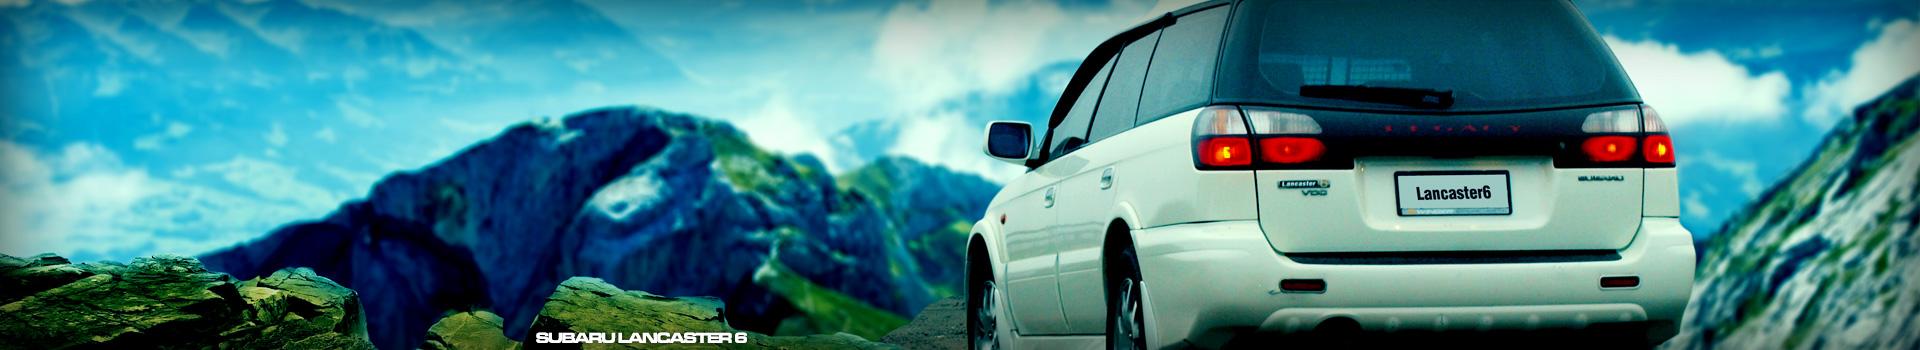 Subaru Legacy & Lancaster | 3-Keys Legacy | Information